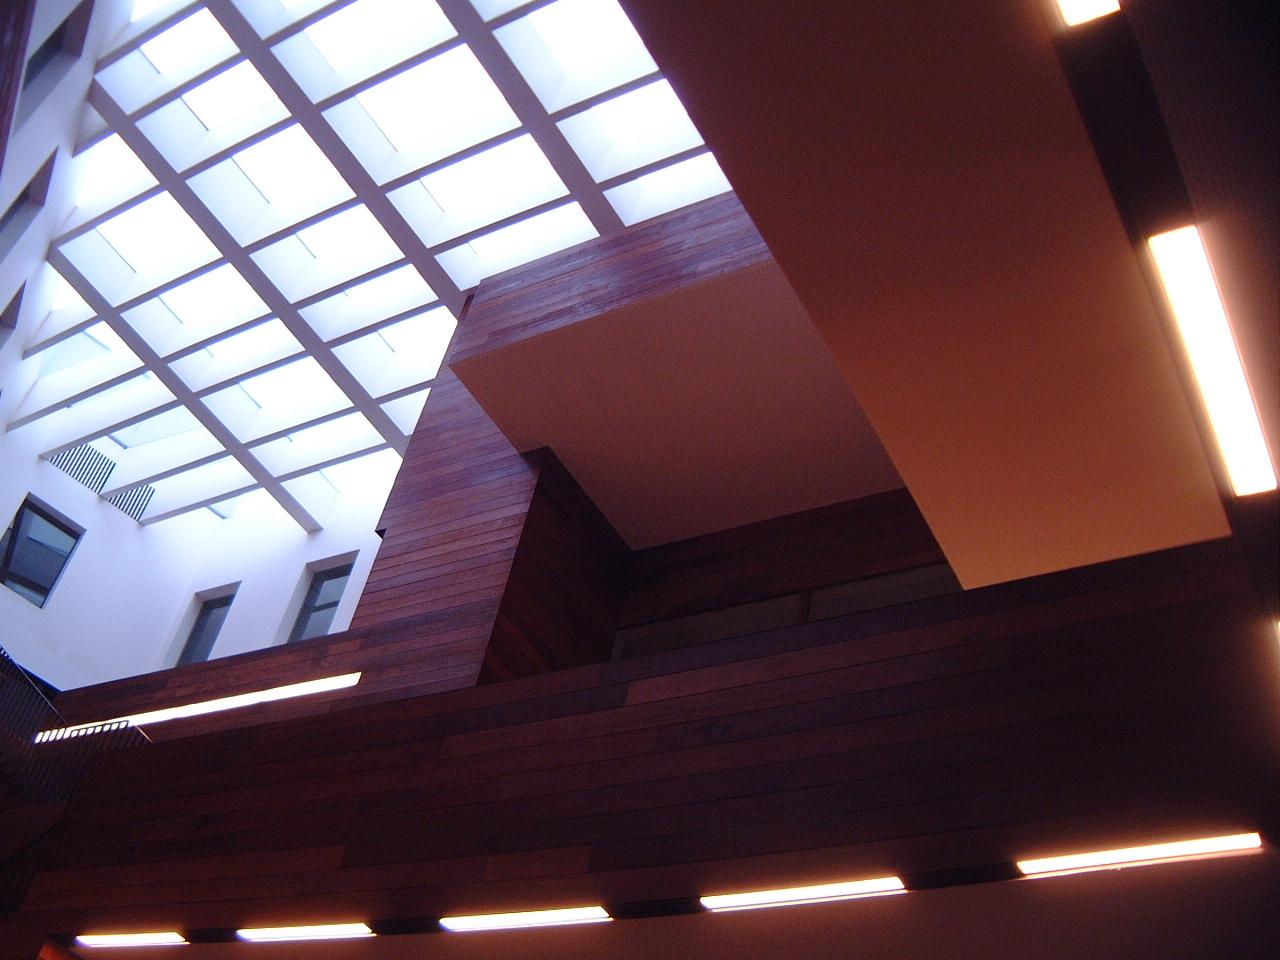 maartent roof glass ceiling building interior modern